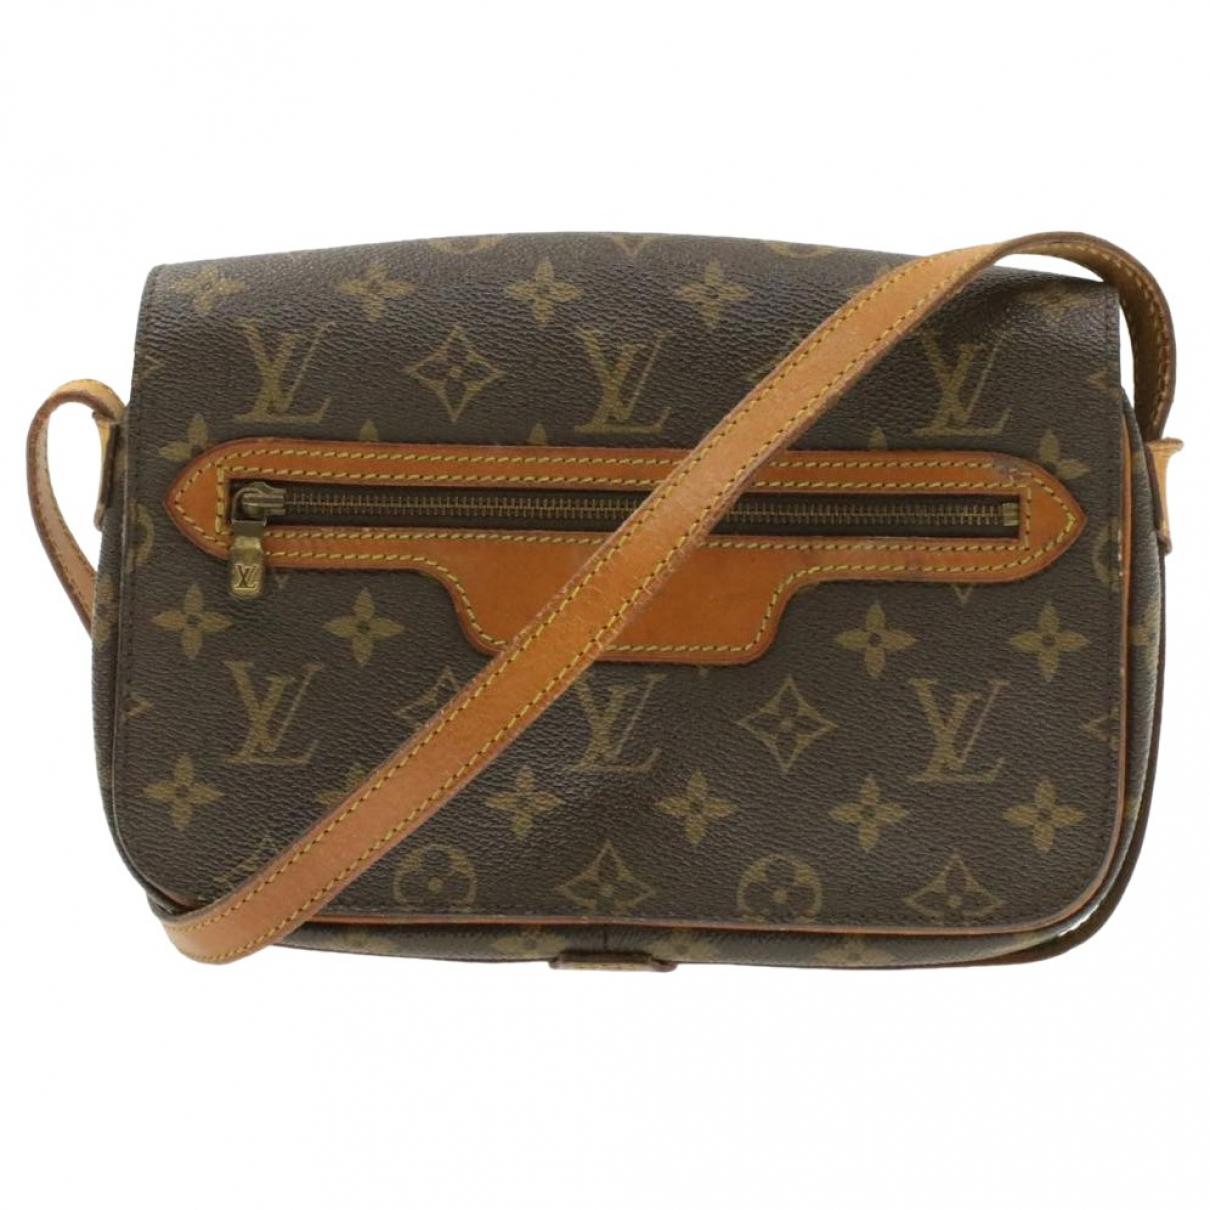 Bolso Saint-Germain de Lona Louis Vuitton